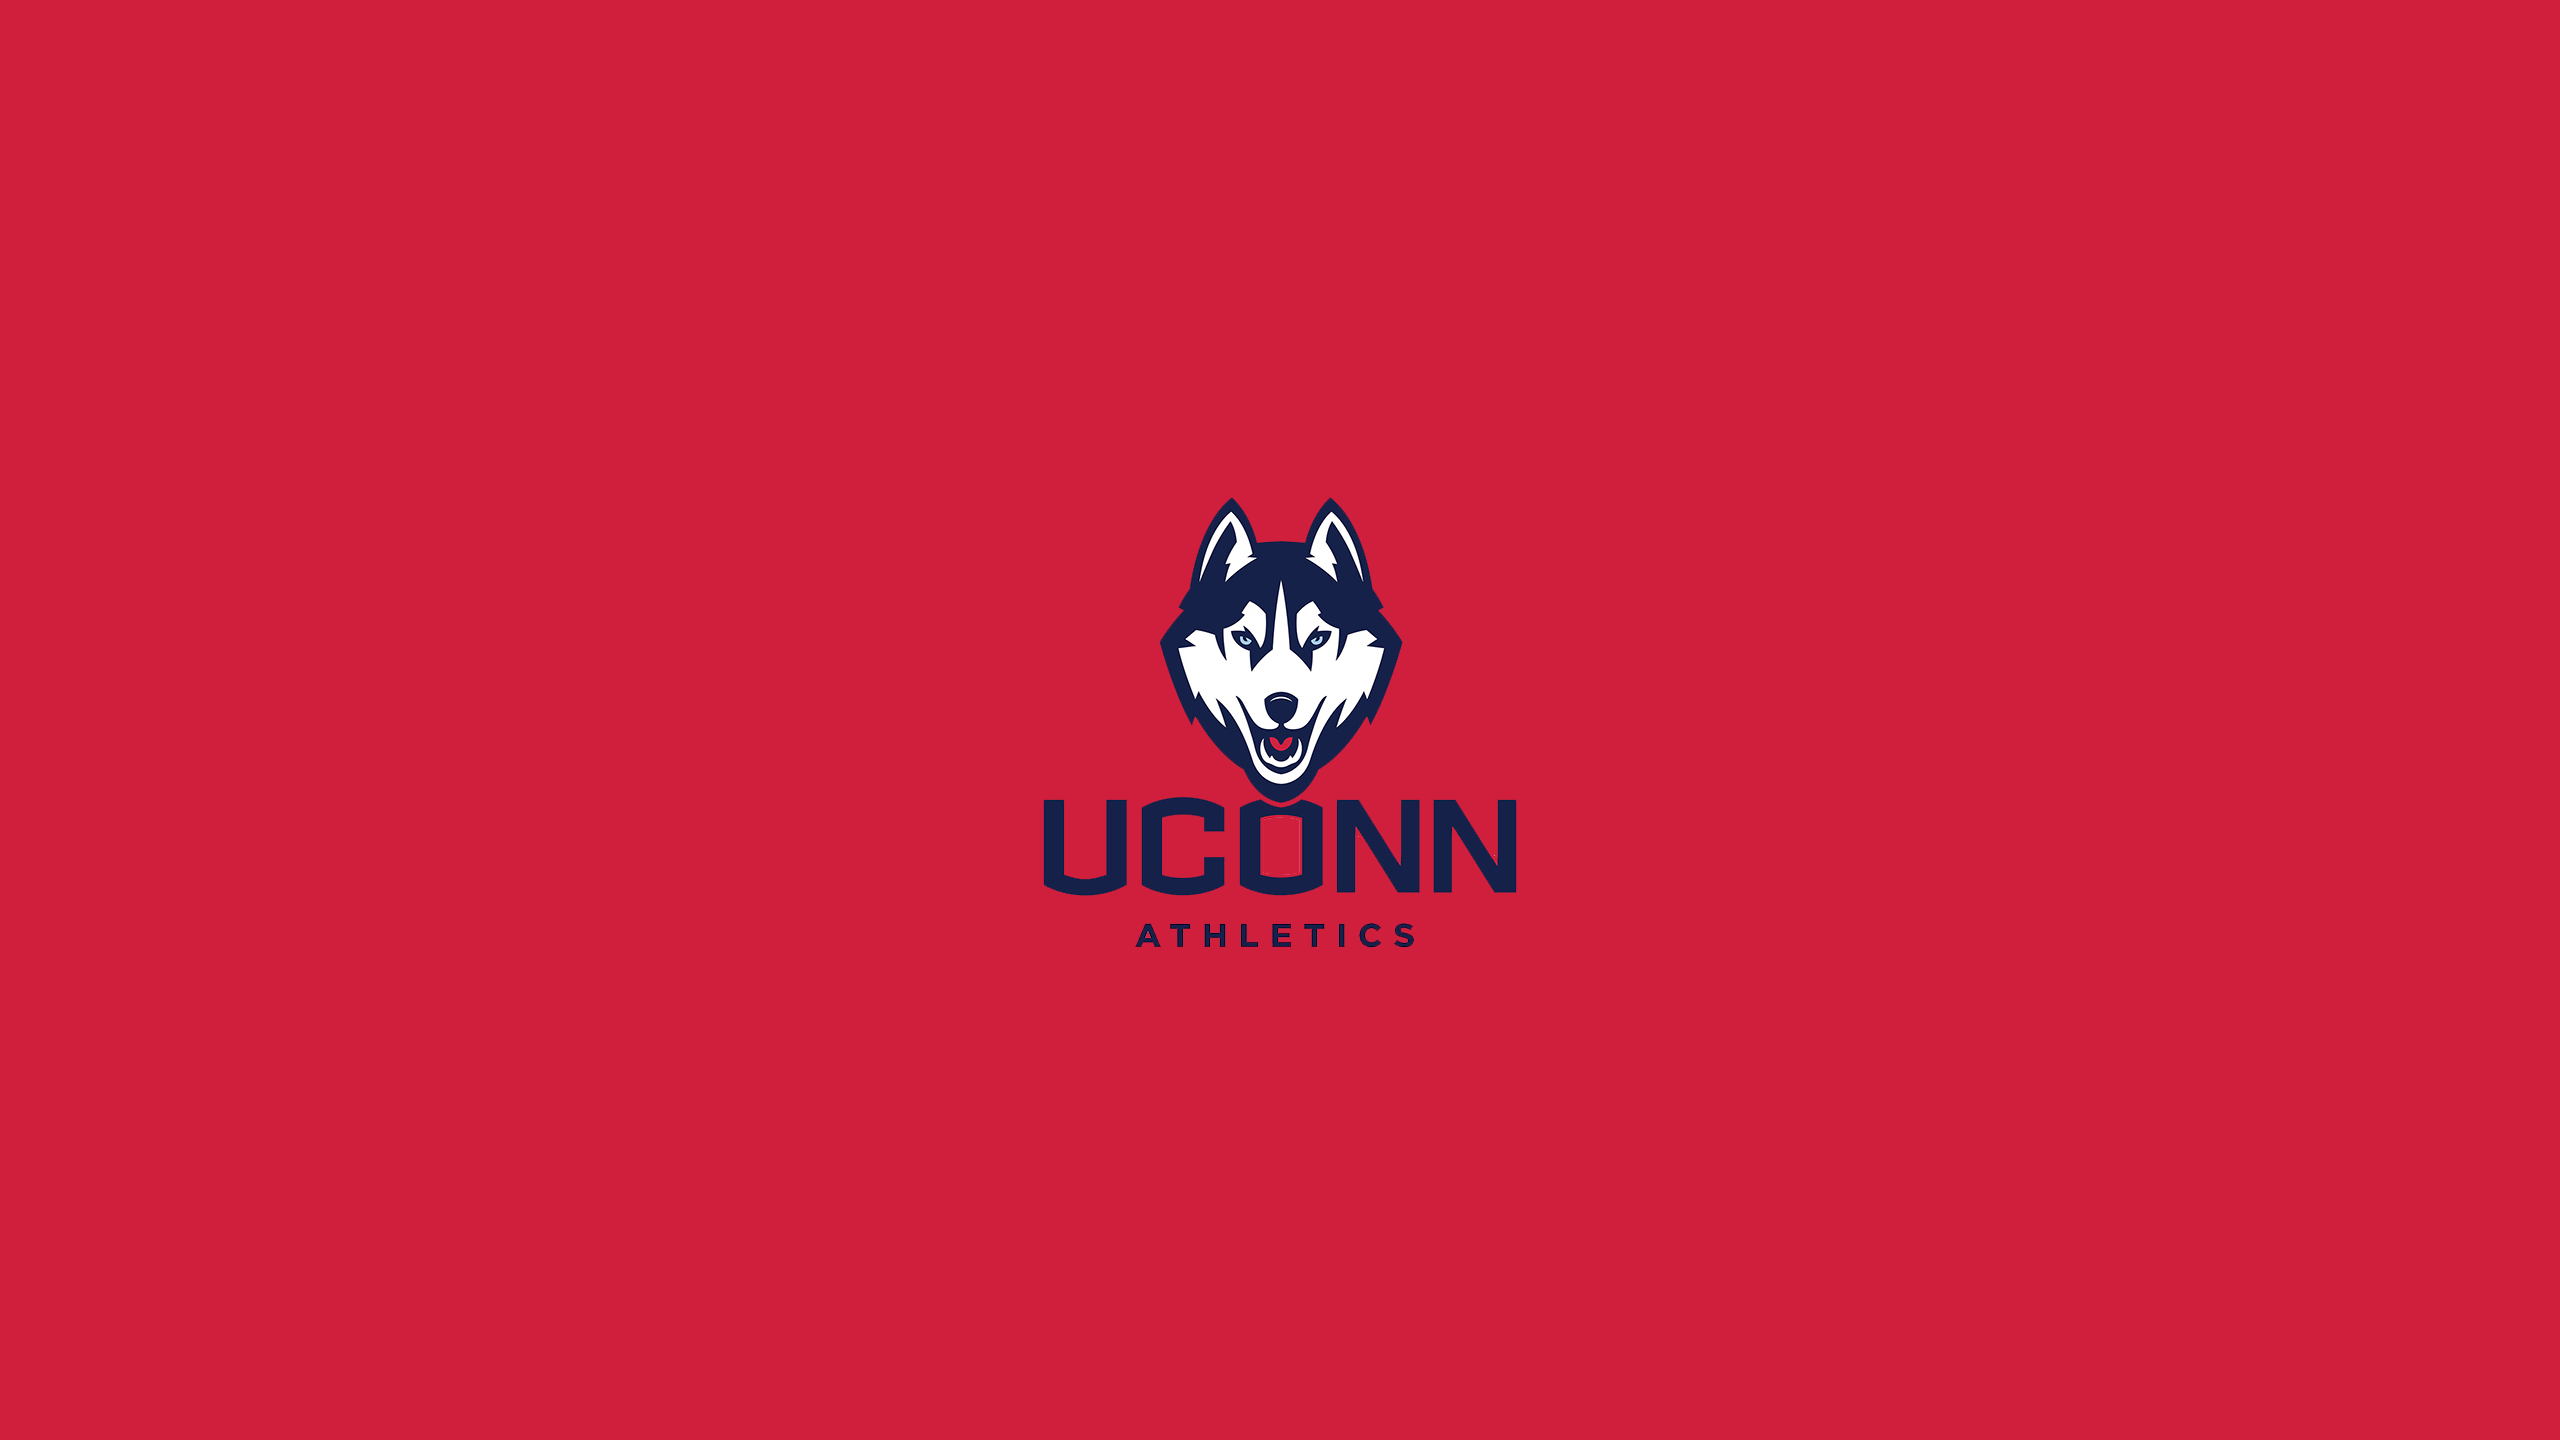 UConn Logo Images TheCelebrityPix 2560x1440